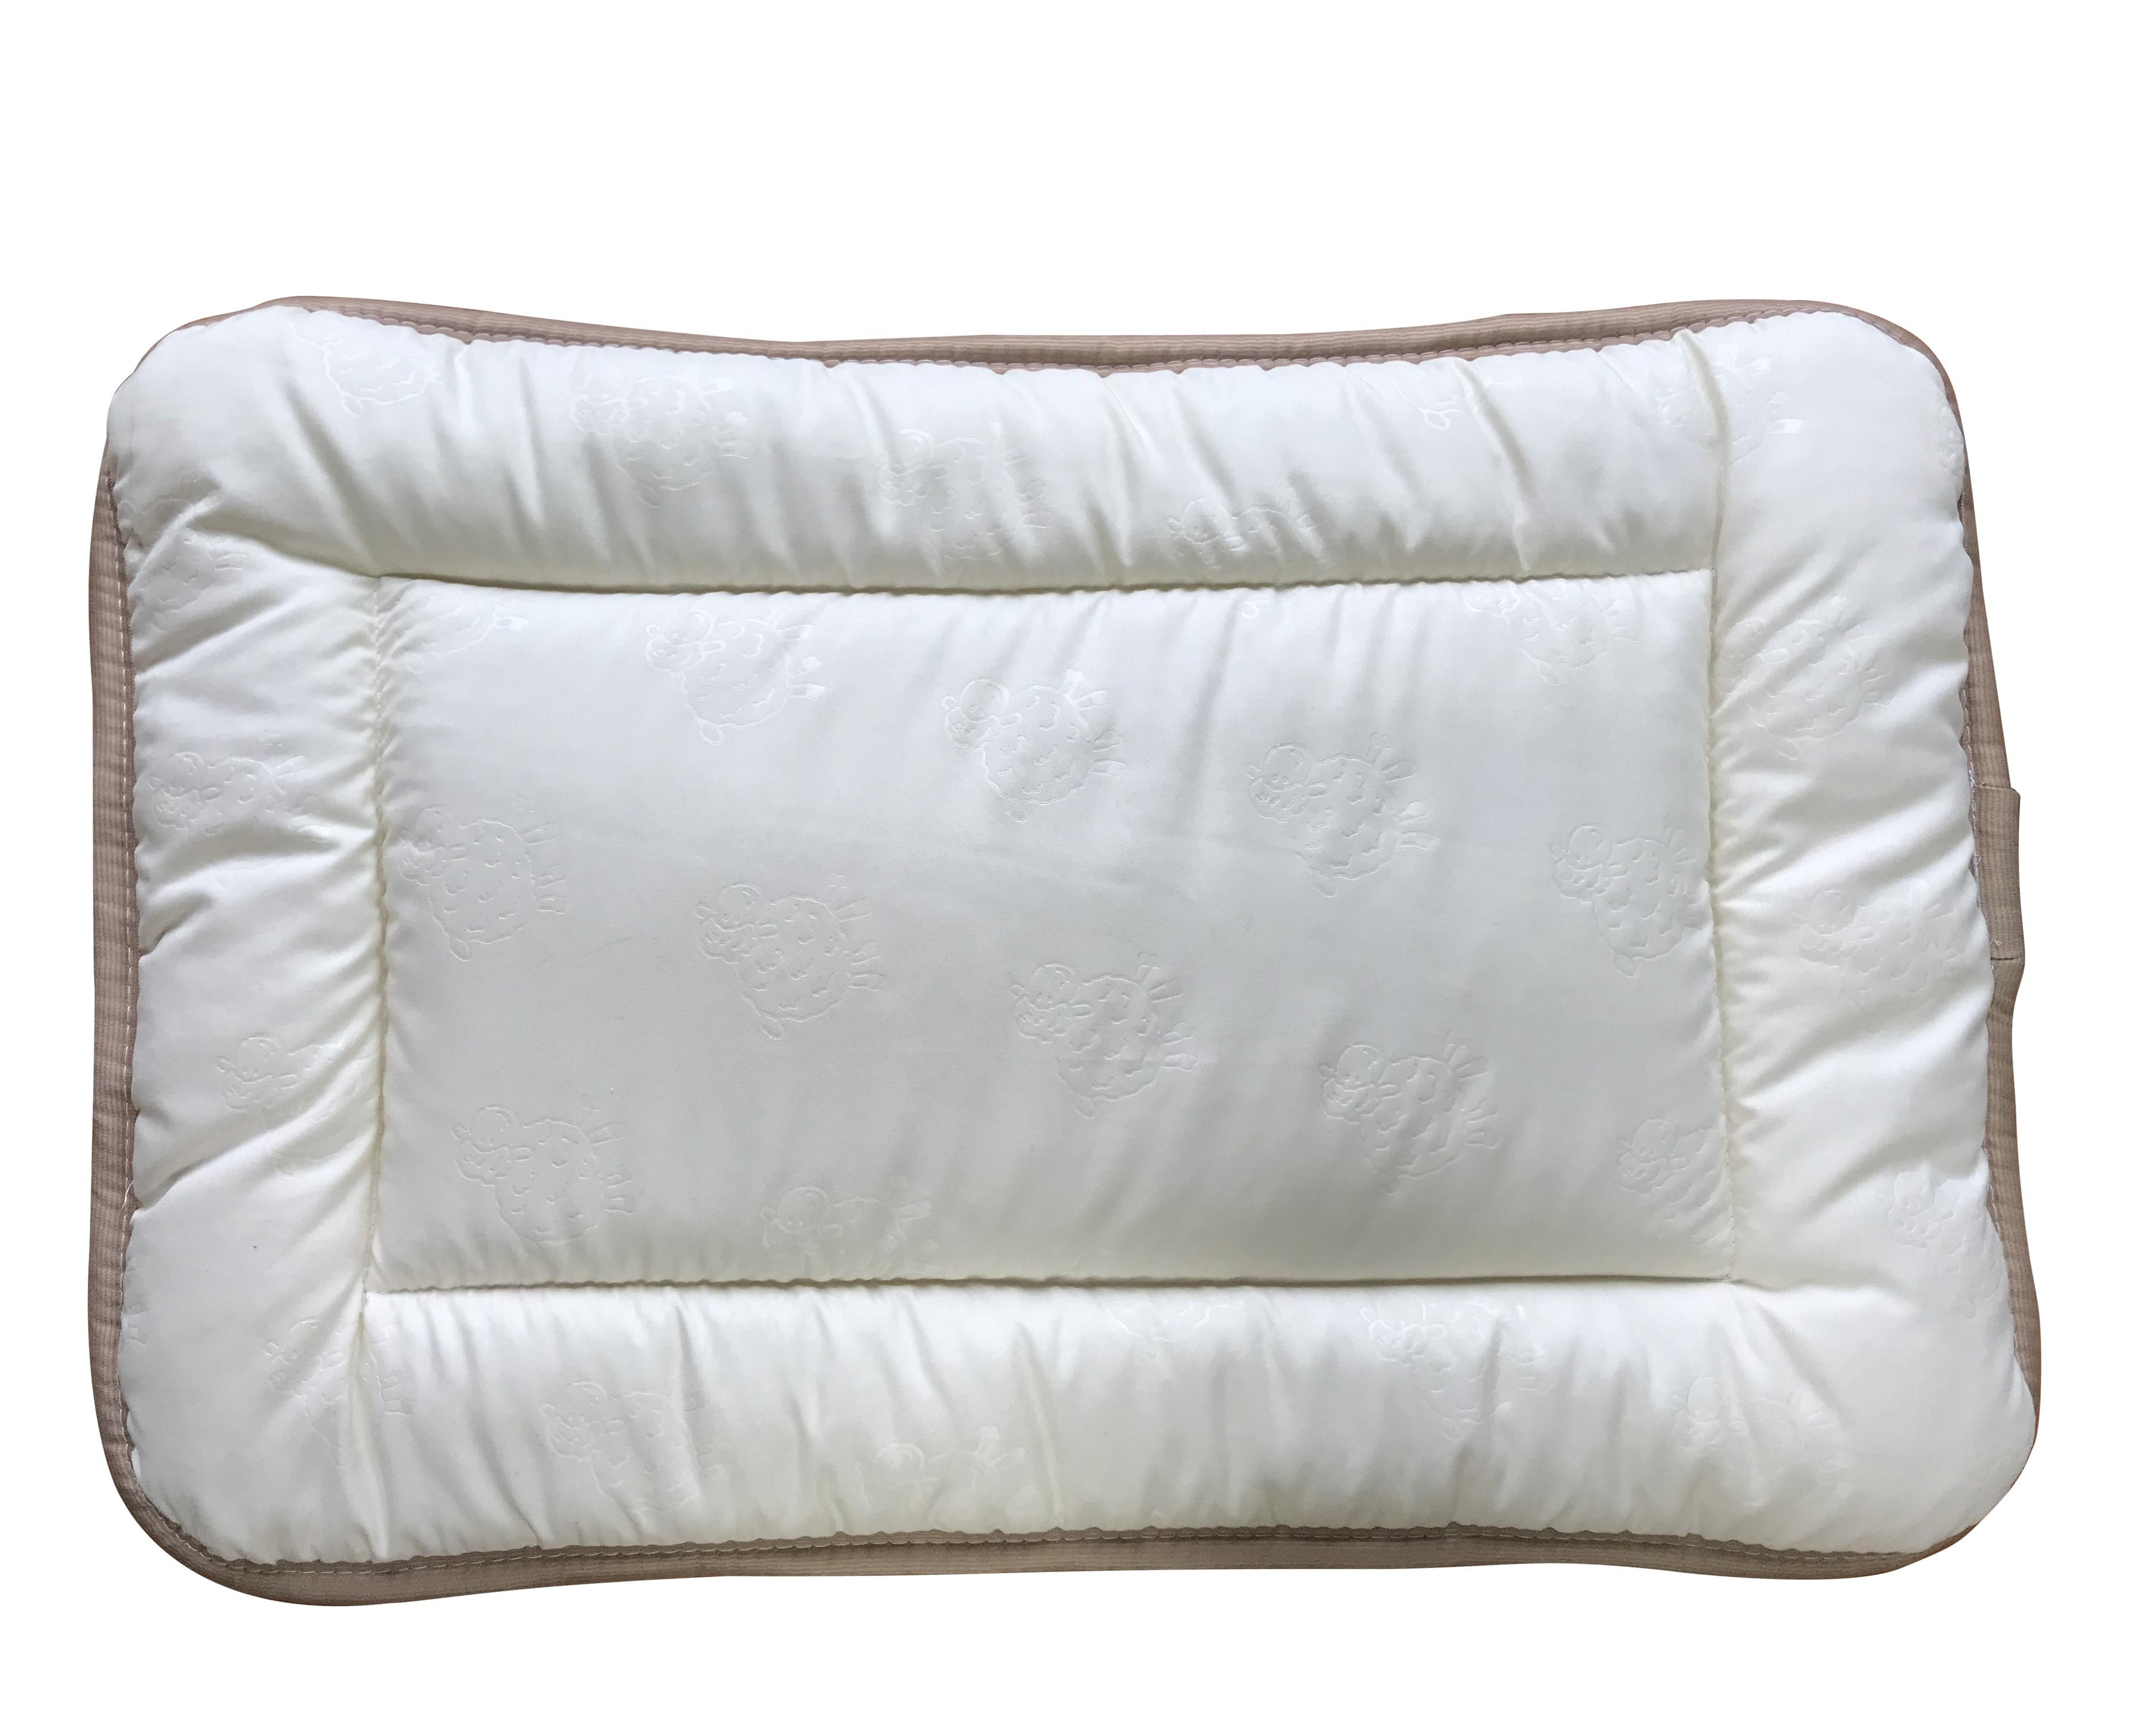 pillow-cassia-grandis-kids-214779-2